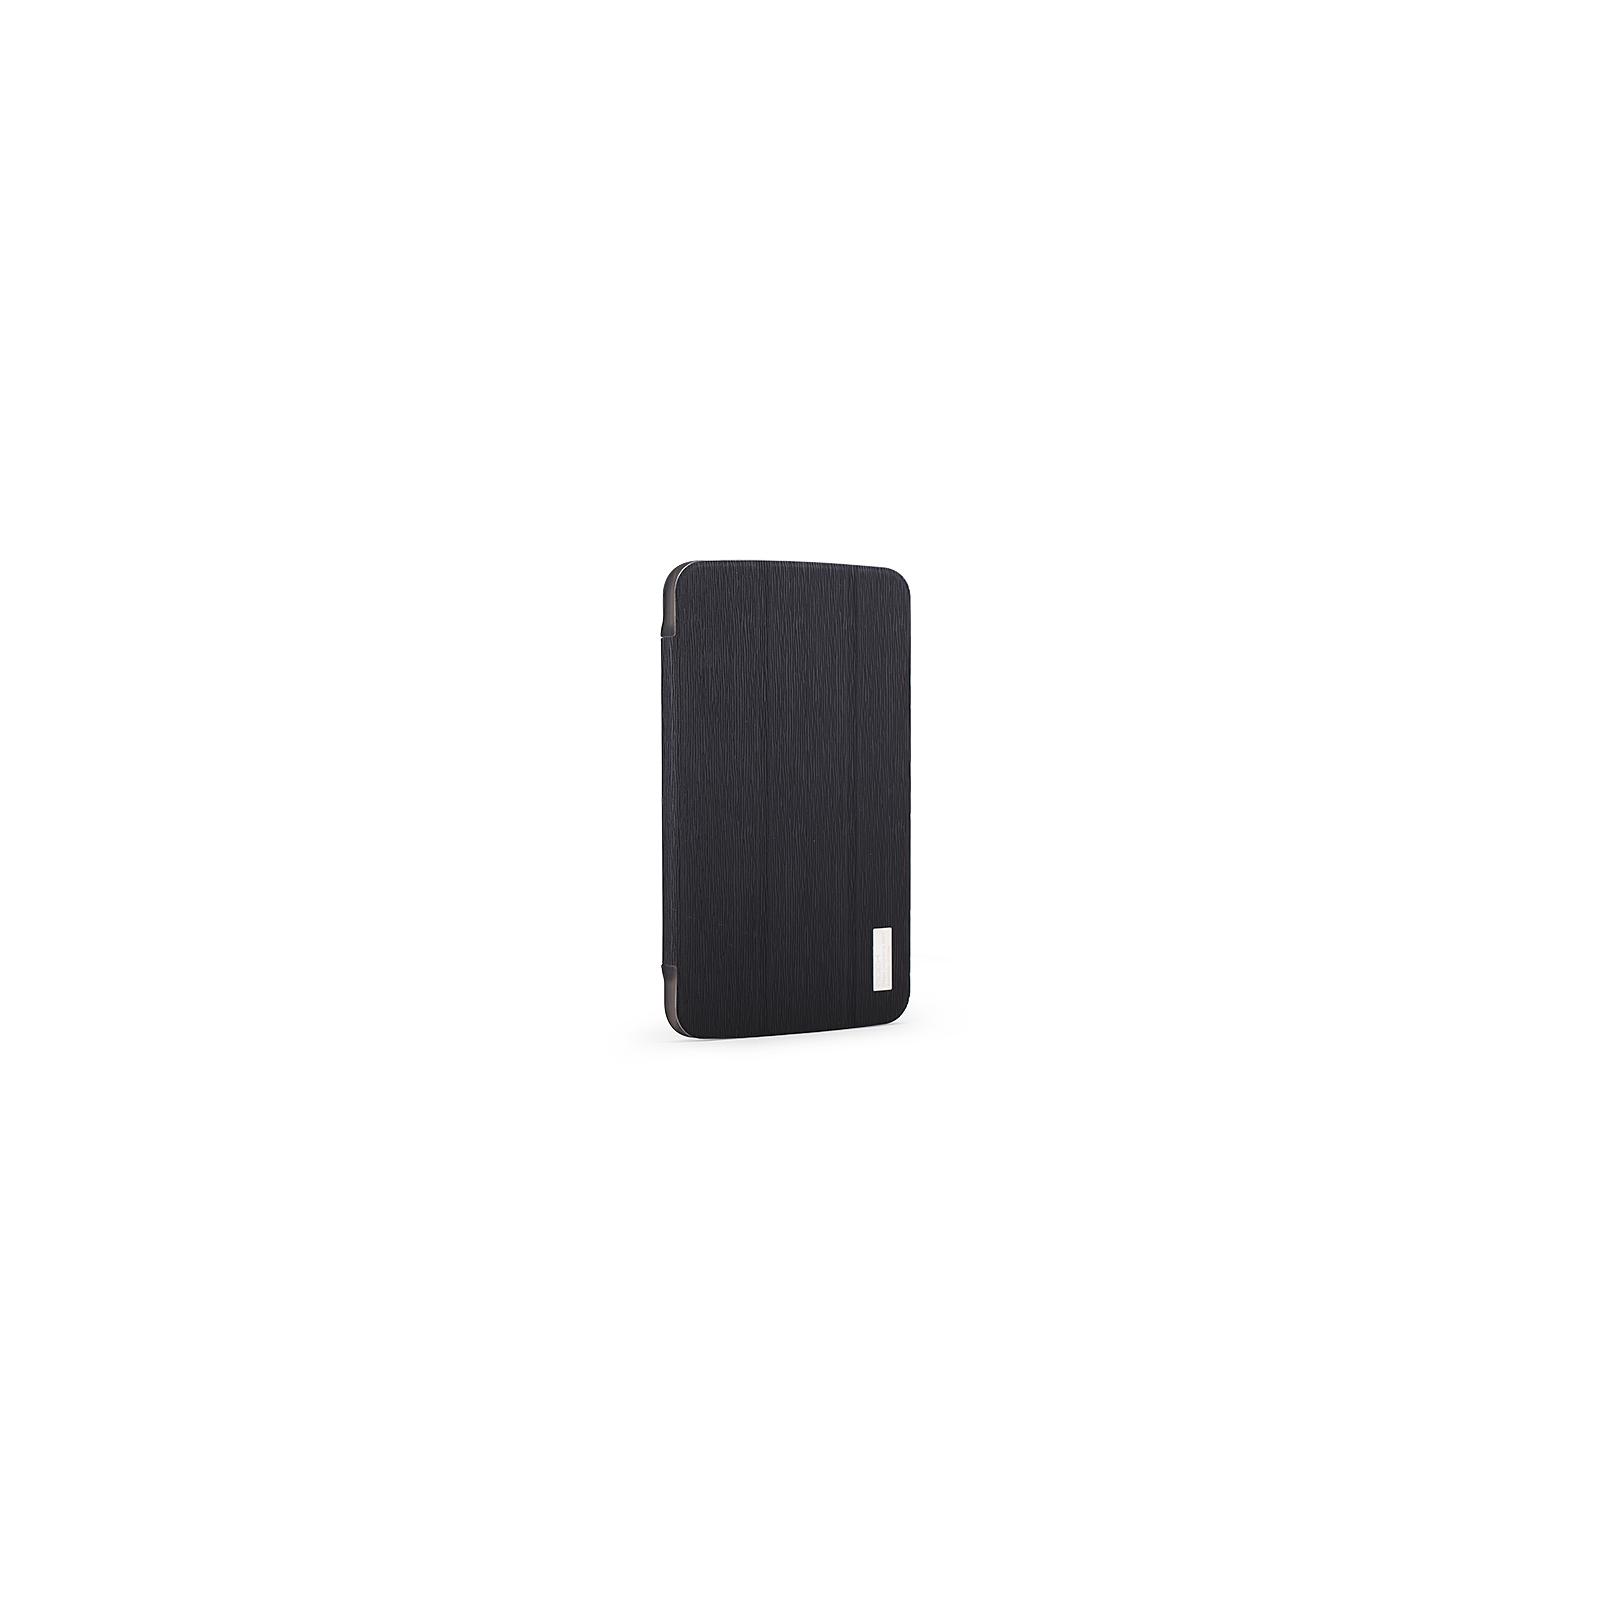 "Чехол для планшета Rock 7"" Samsung Galaxy Tab 3 7.0 T2100/T2110 Elegant Series (31849 black) изображение 2"